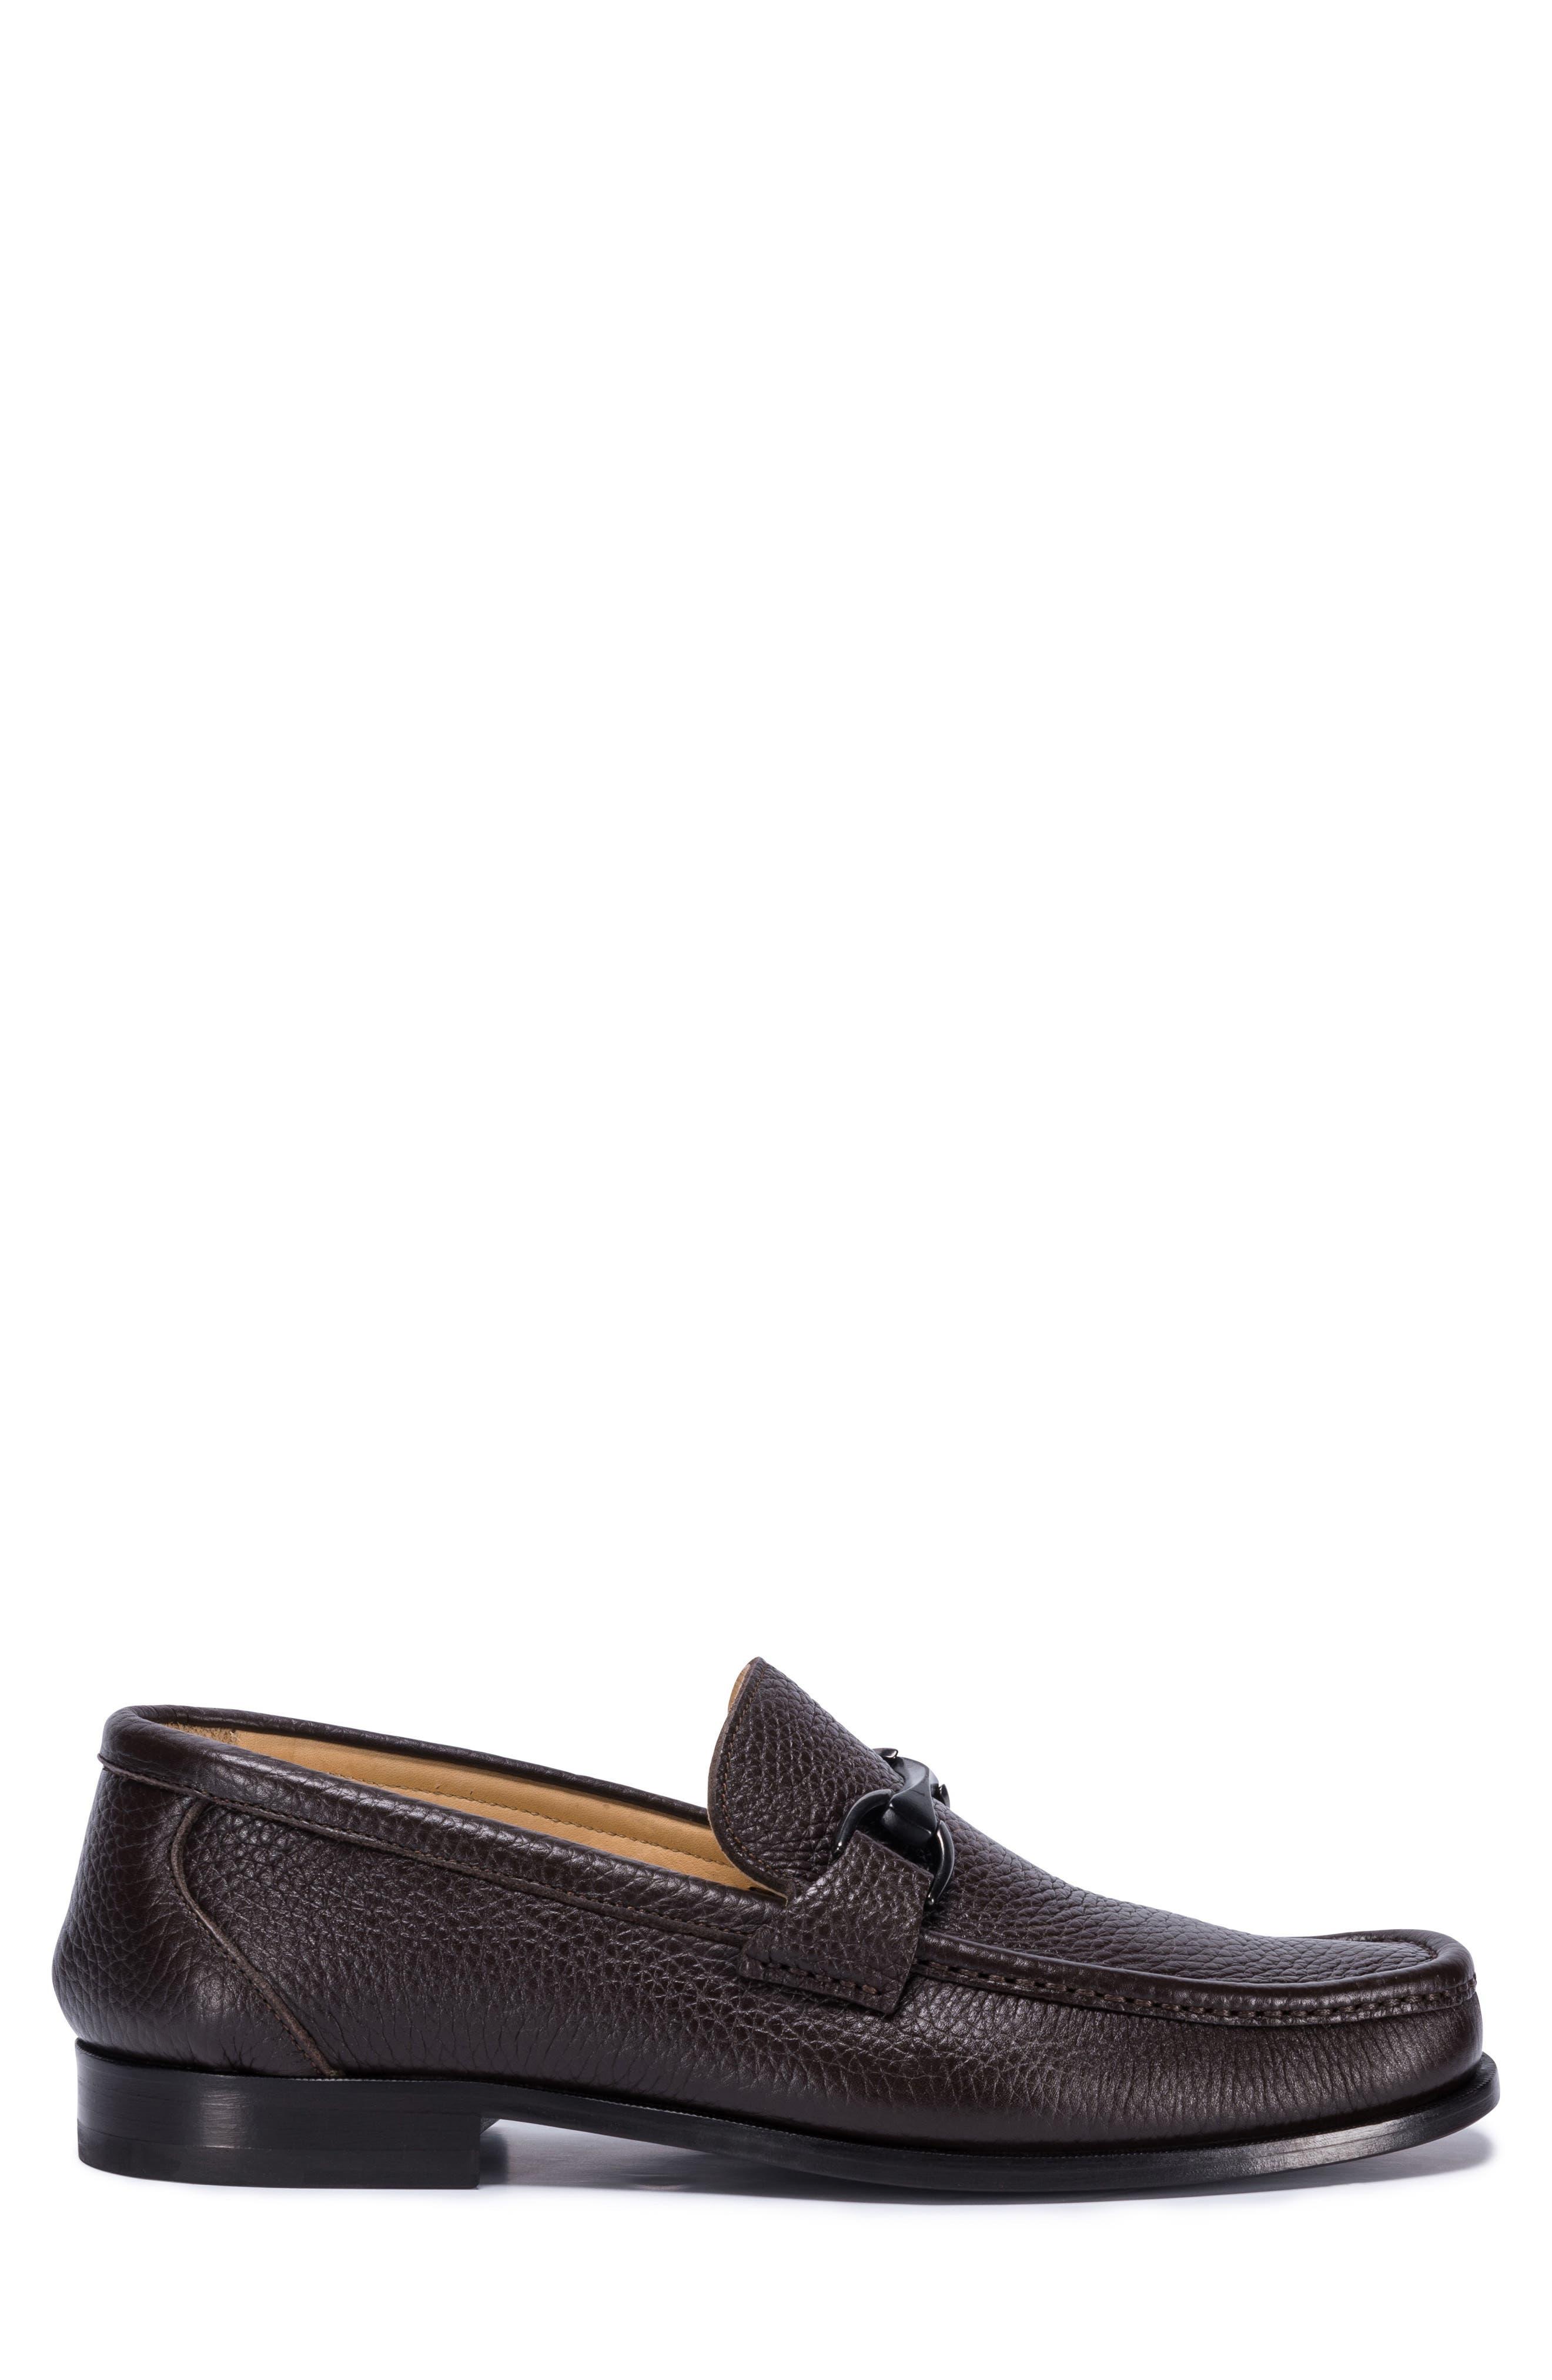 Padua Bit Loafer,                             Alternate thumbnail 3, color,                             Brown Leather